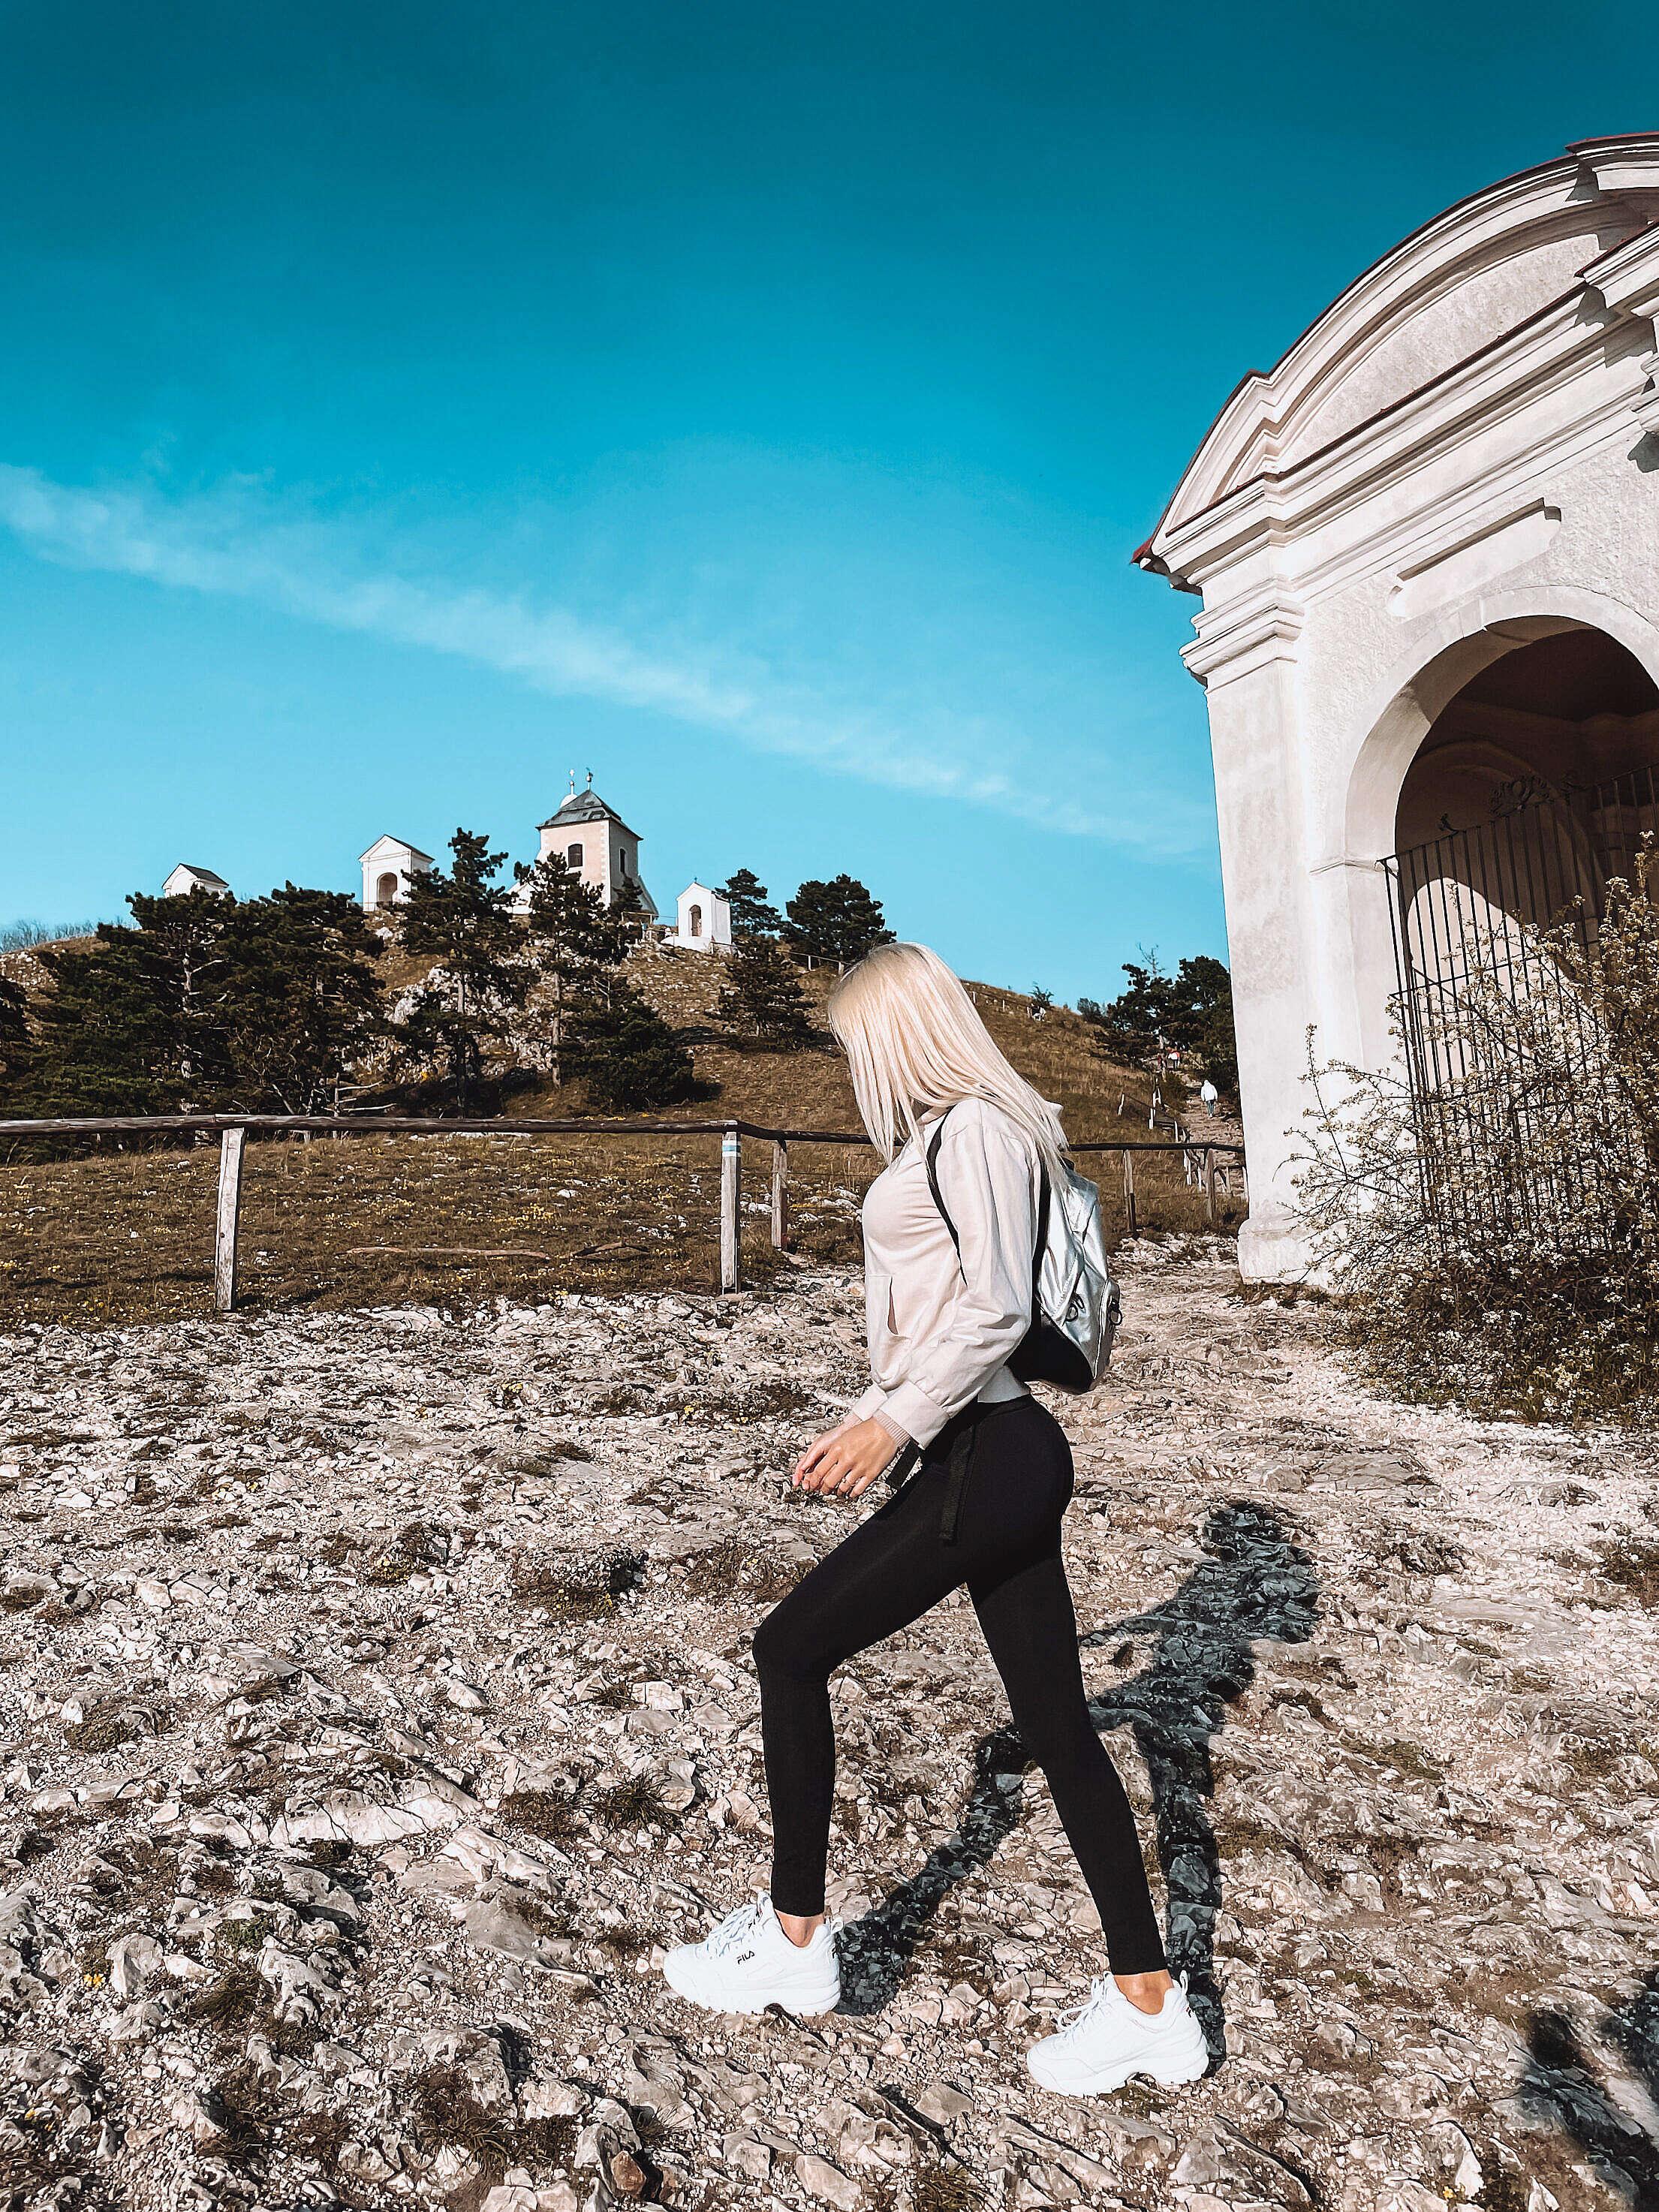 Woman on a Walk to Svaty Kopecek in Mikulov, Czechia Free Stock Photo